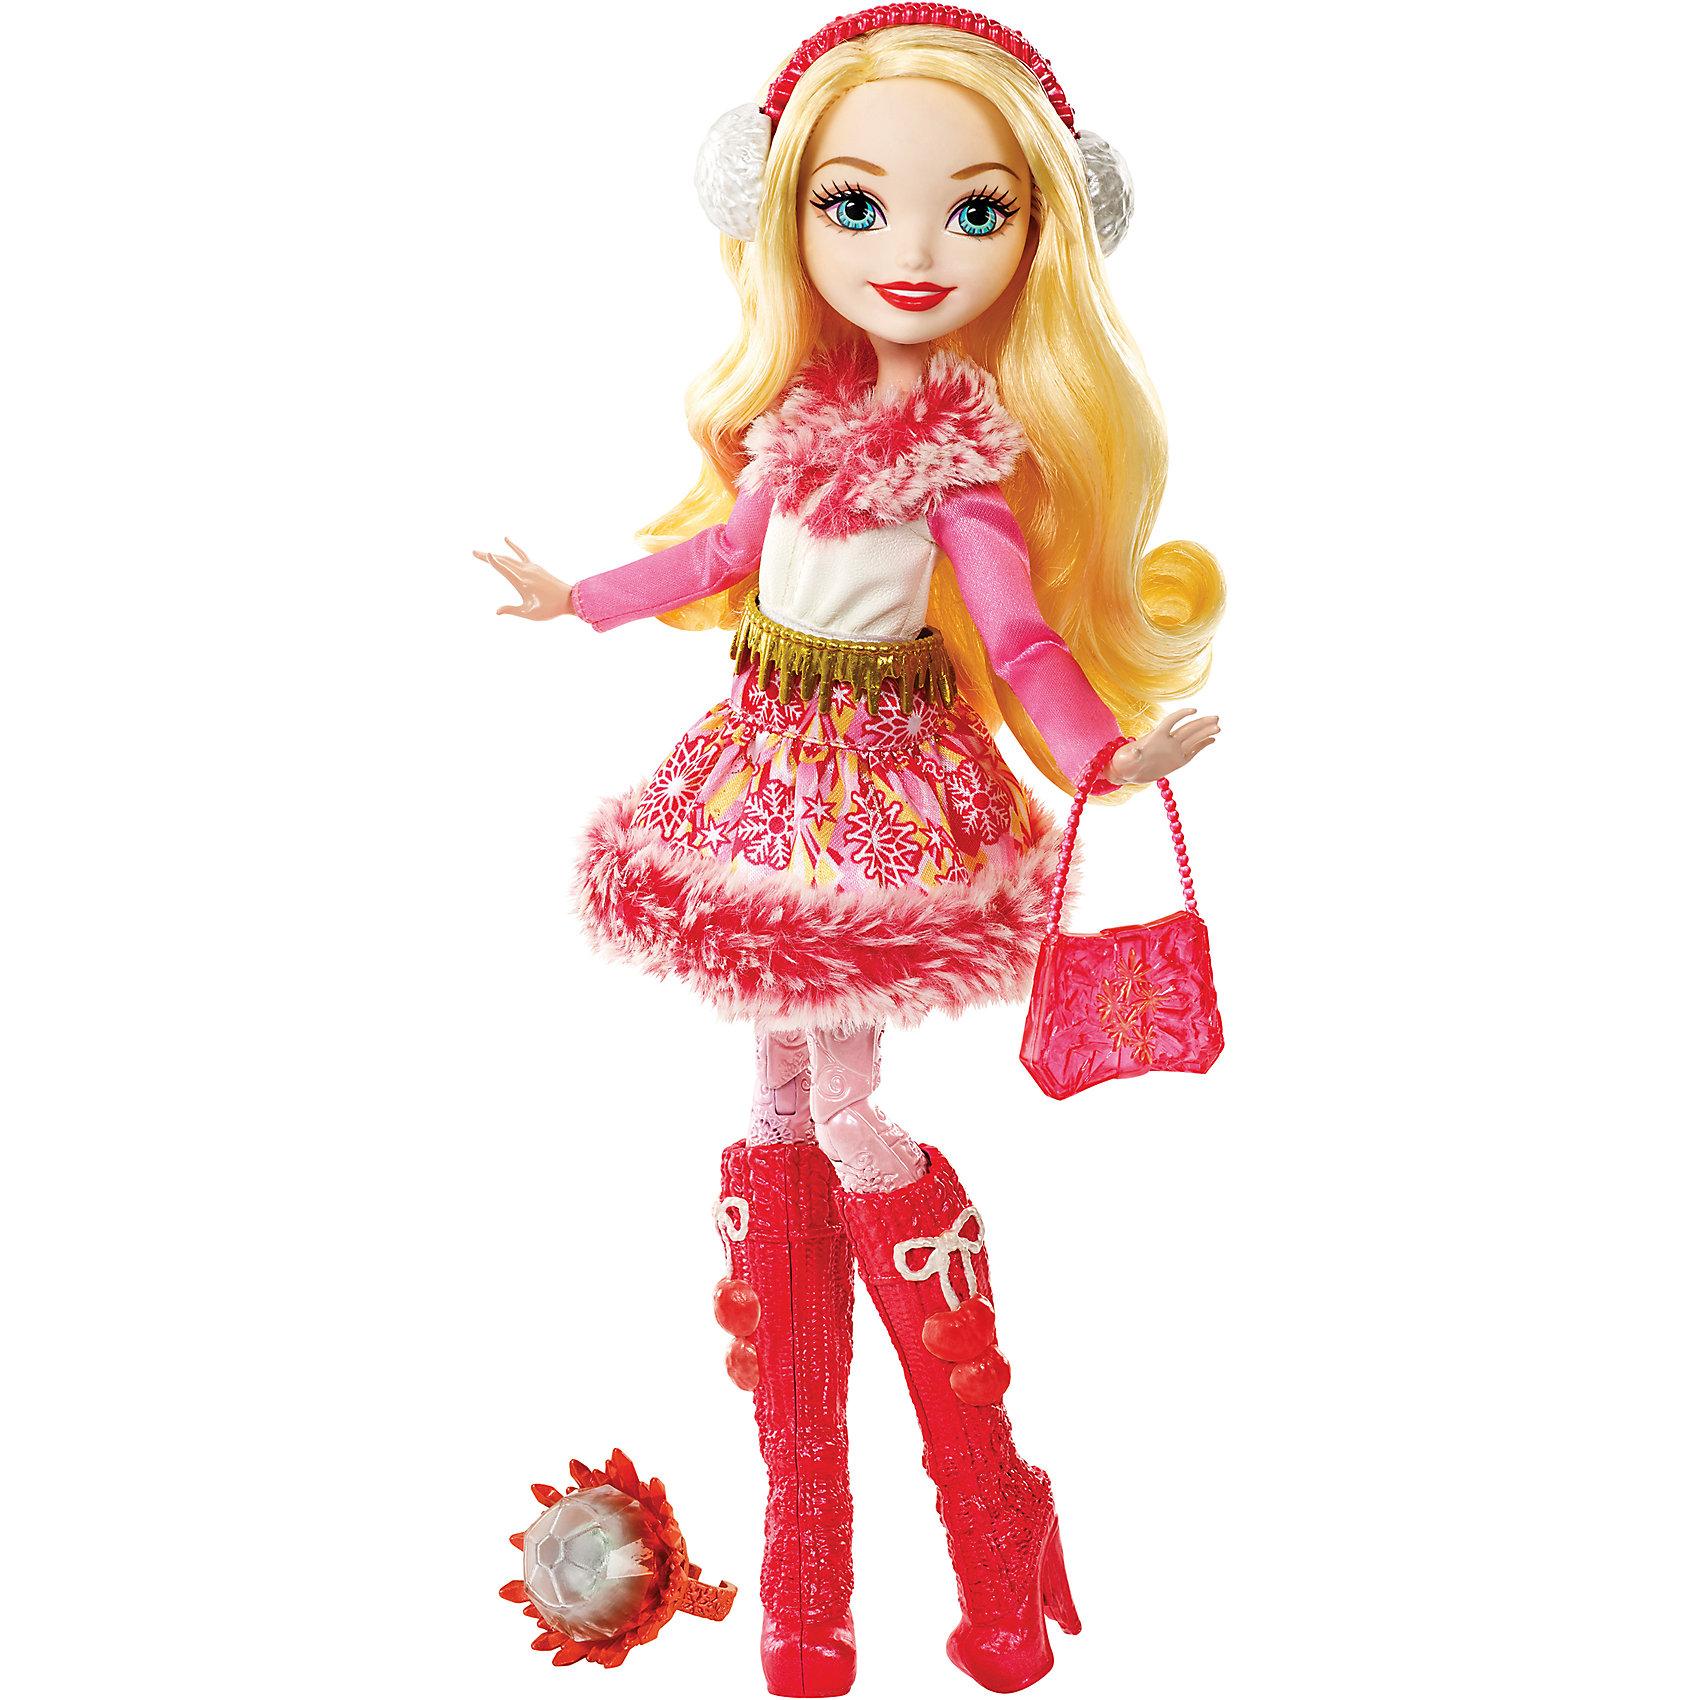 Mattel Кукла из коллекции Заколдованная зима, Ever After High mattel набор блестящий вихрь из серии заколдованная зима кукла кристал винтер ever after high